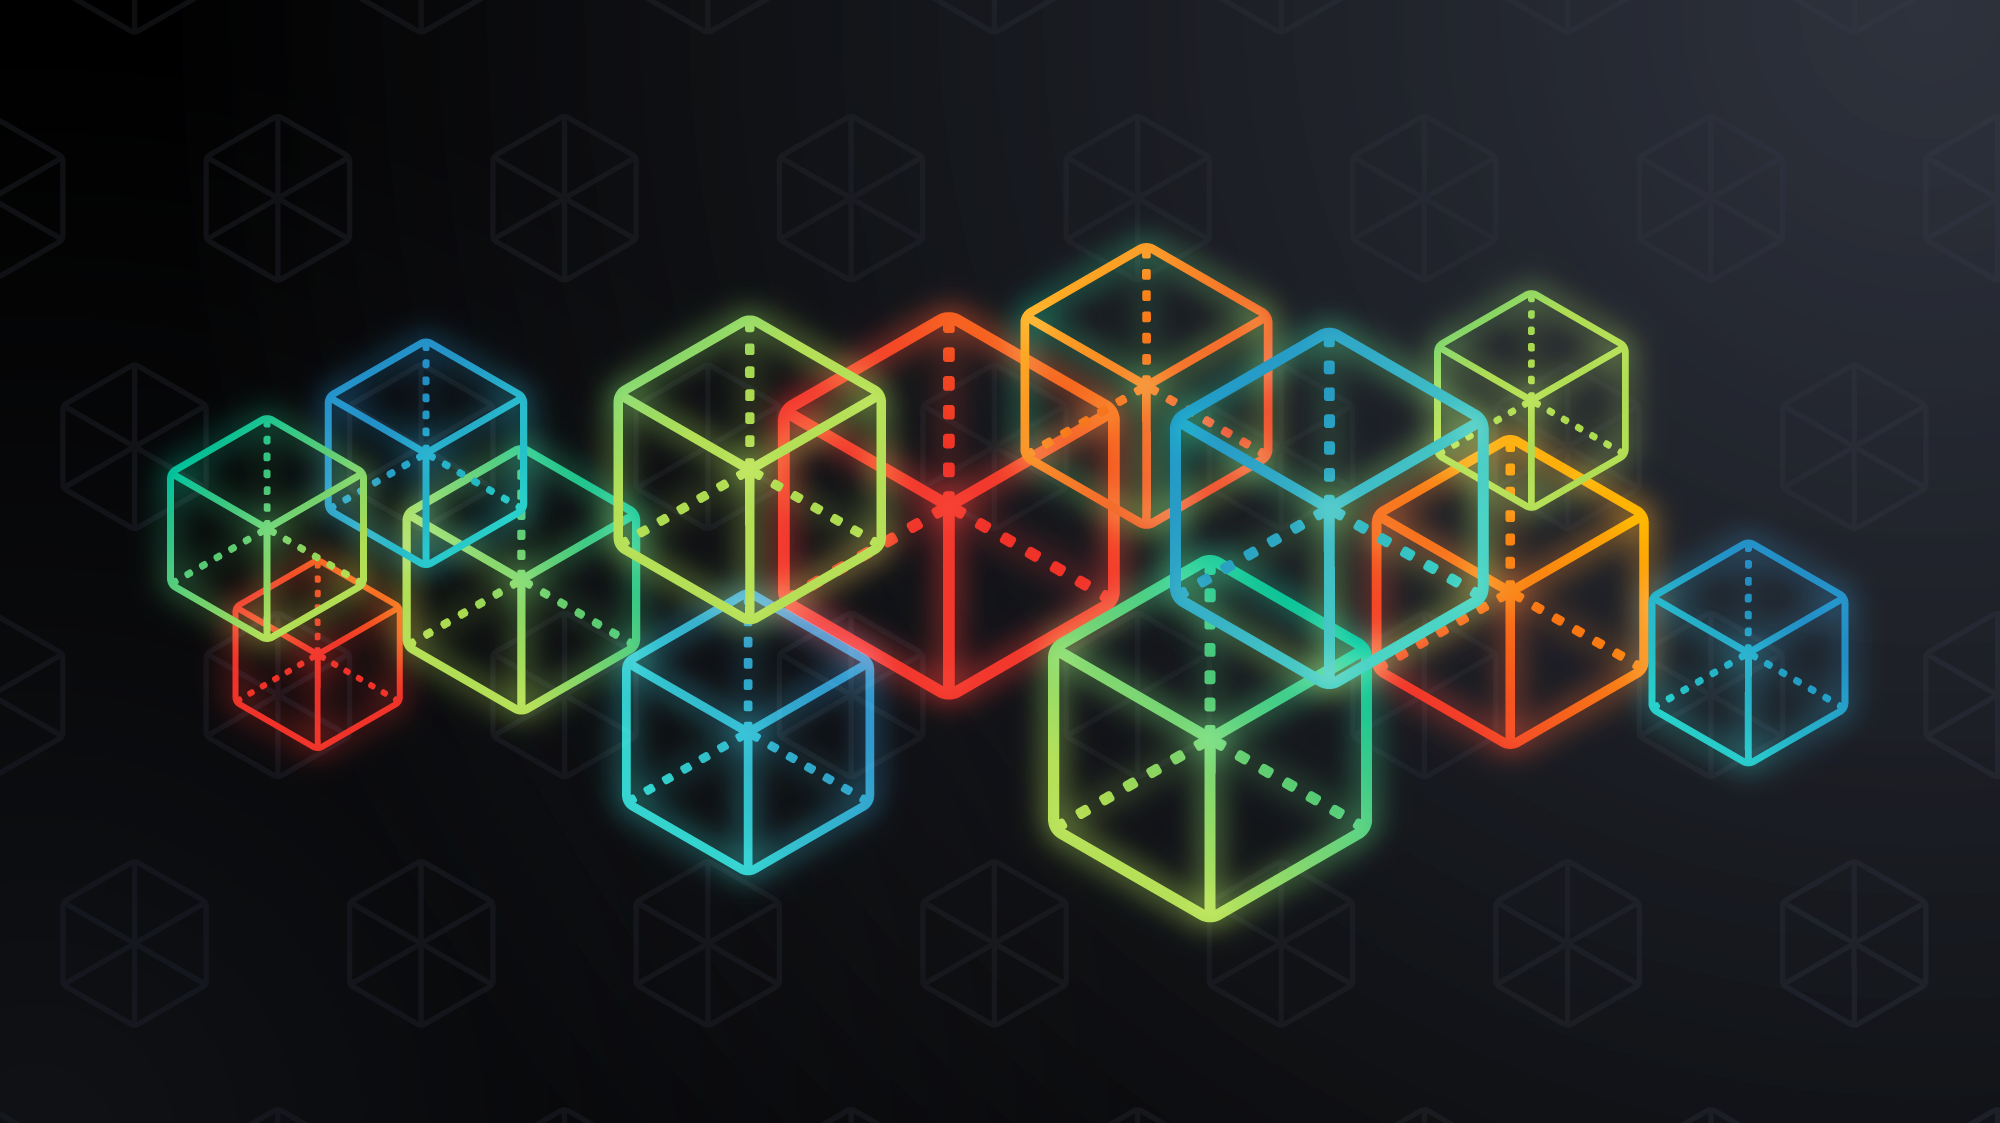 vector-cubes-blocks-colors-black-background.png